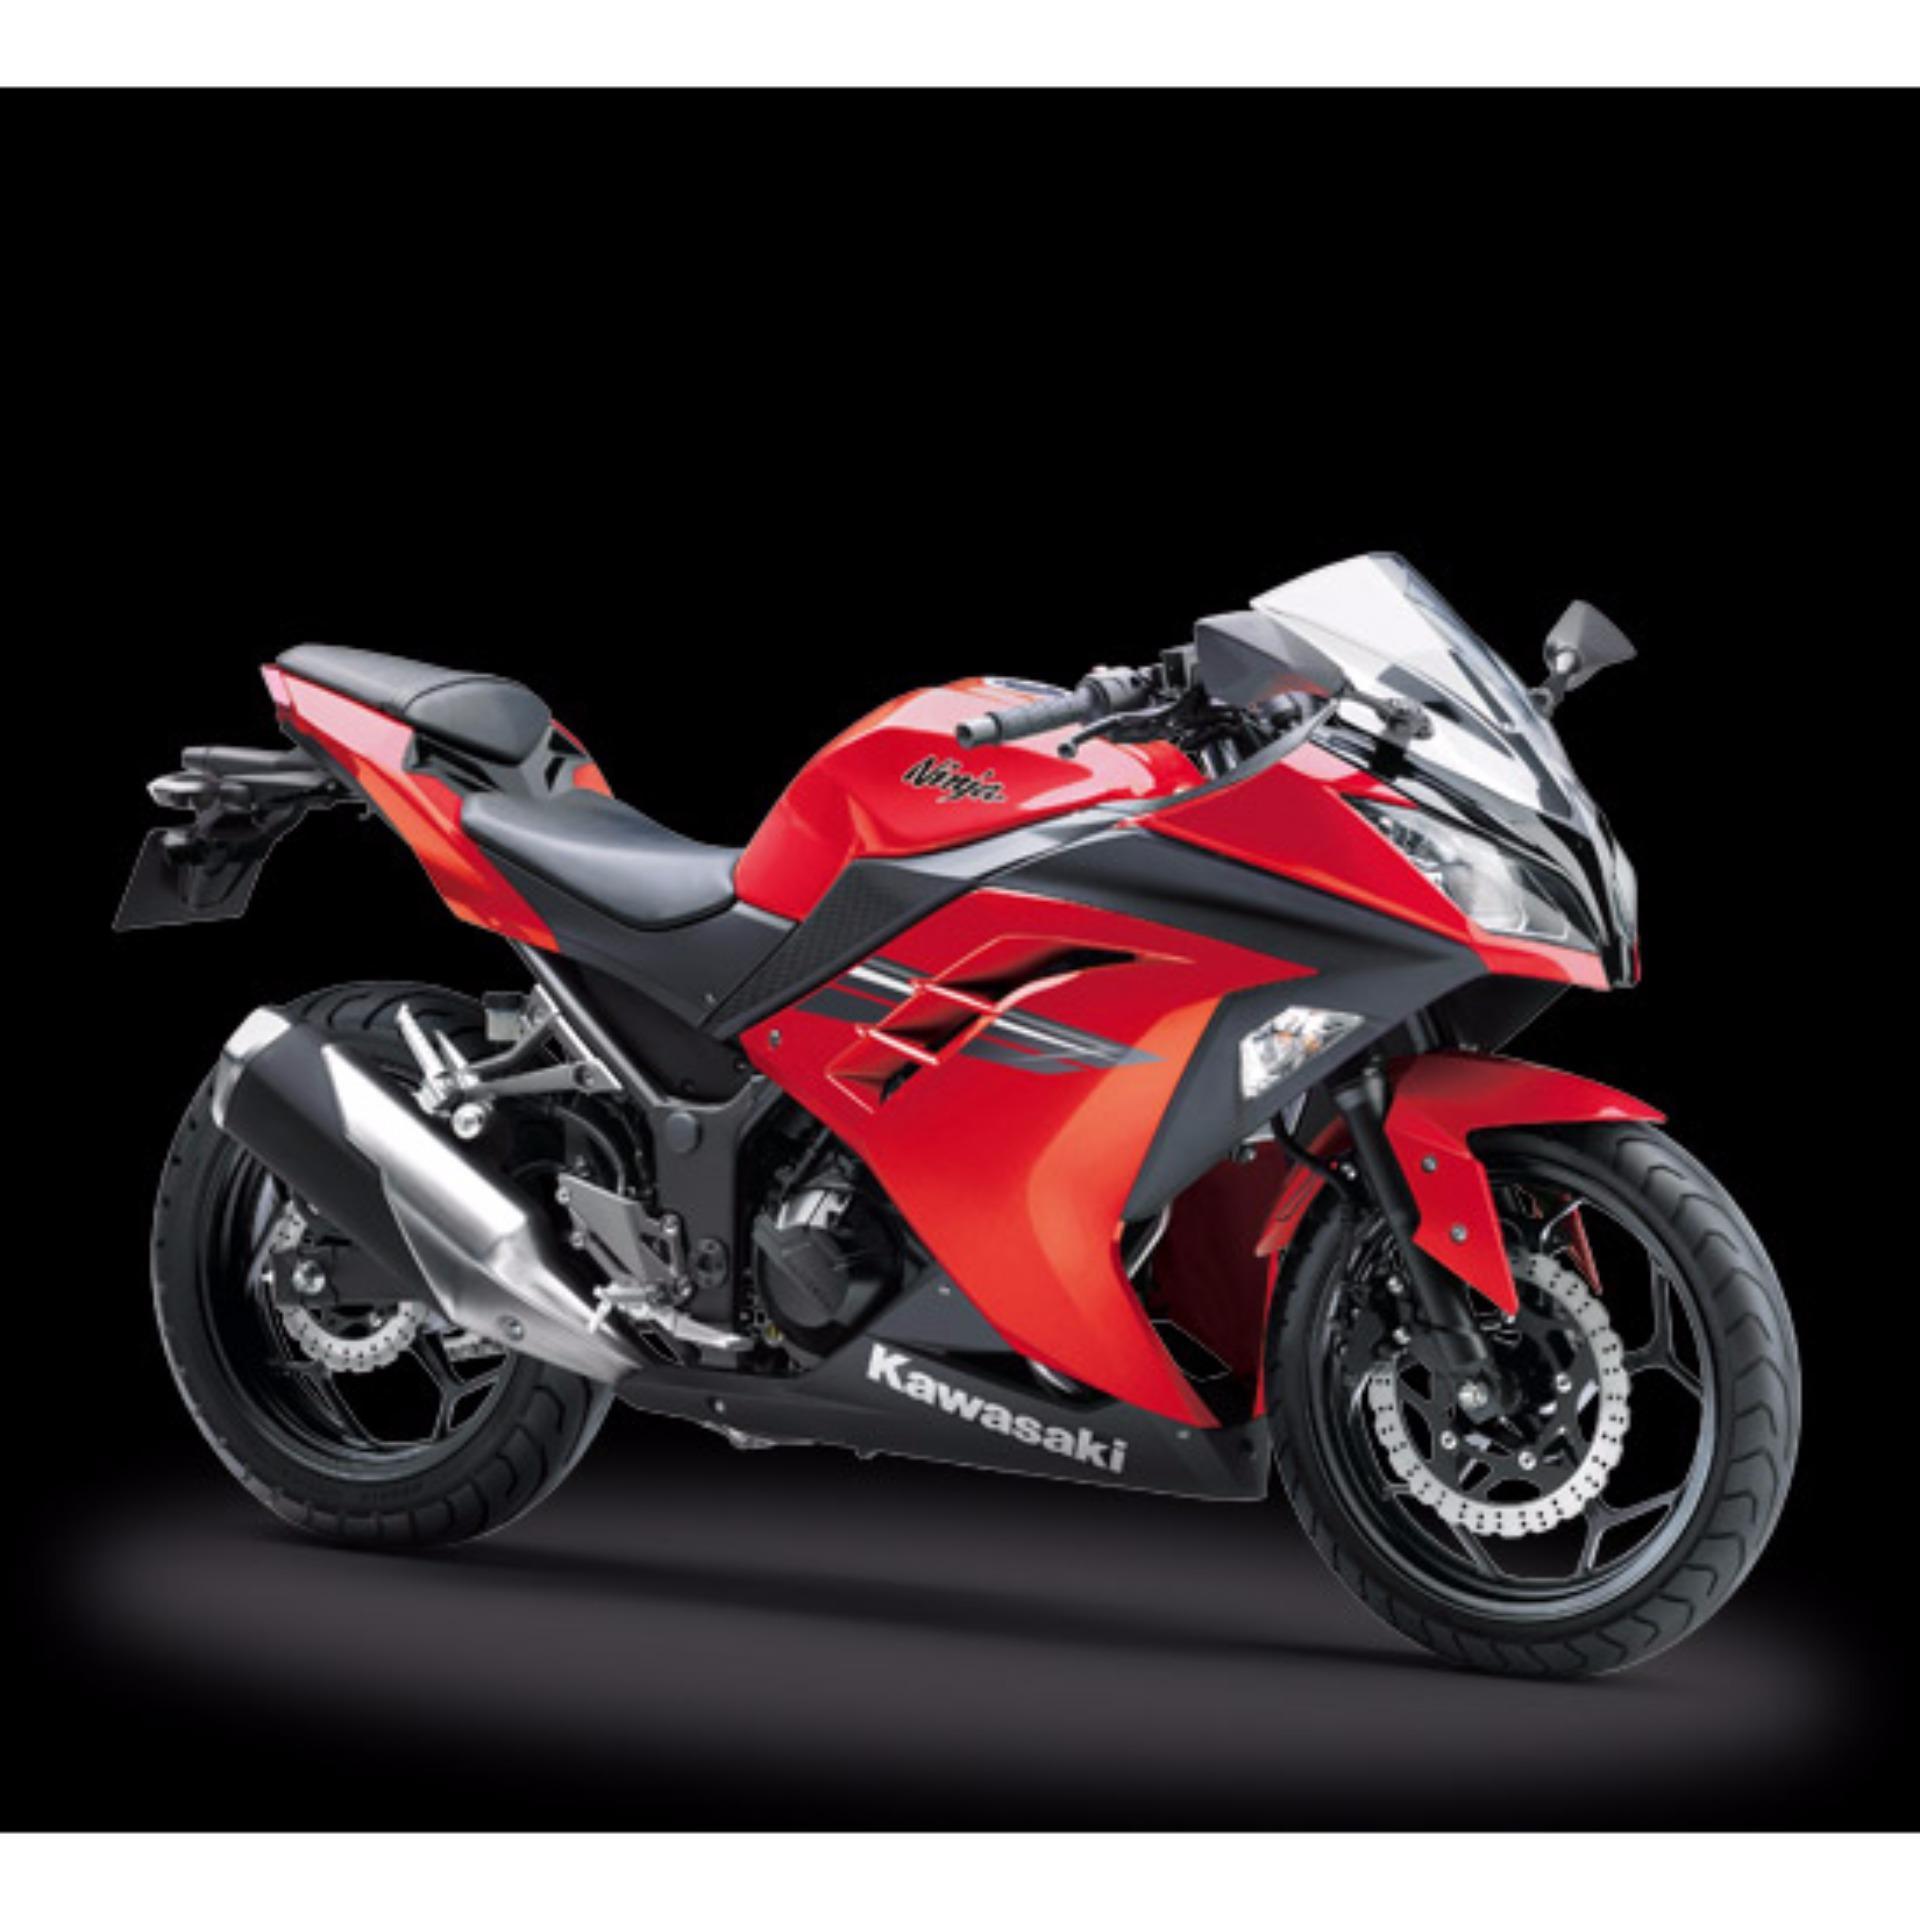 Jalu Baut Paddock Pedok Full Cnc Warna Motor Ninja 250 Karbu Fi Wilwood 1473 2 Universal Silver Kawasaki Non Abs